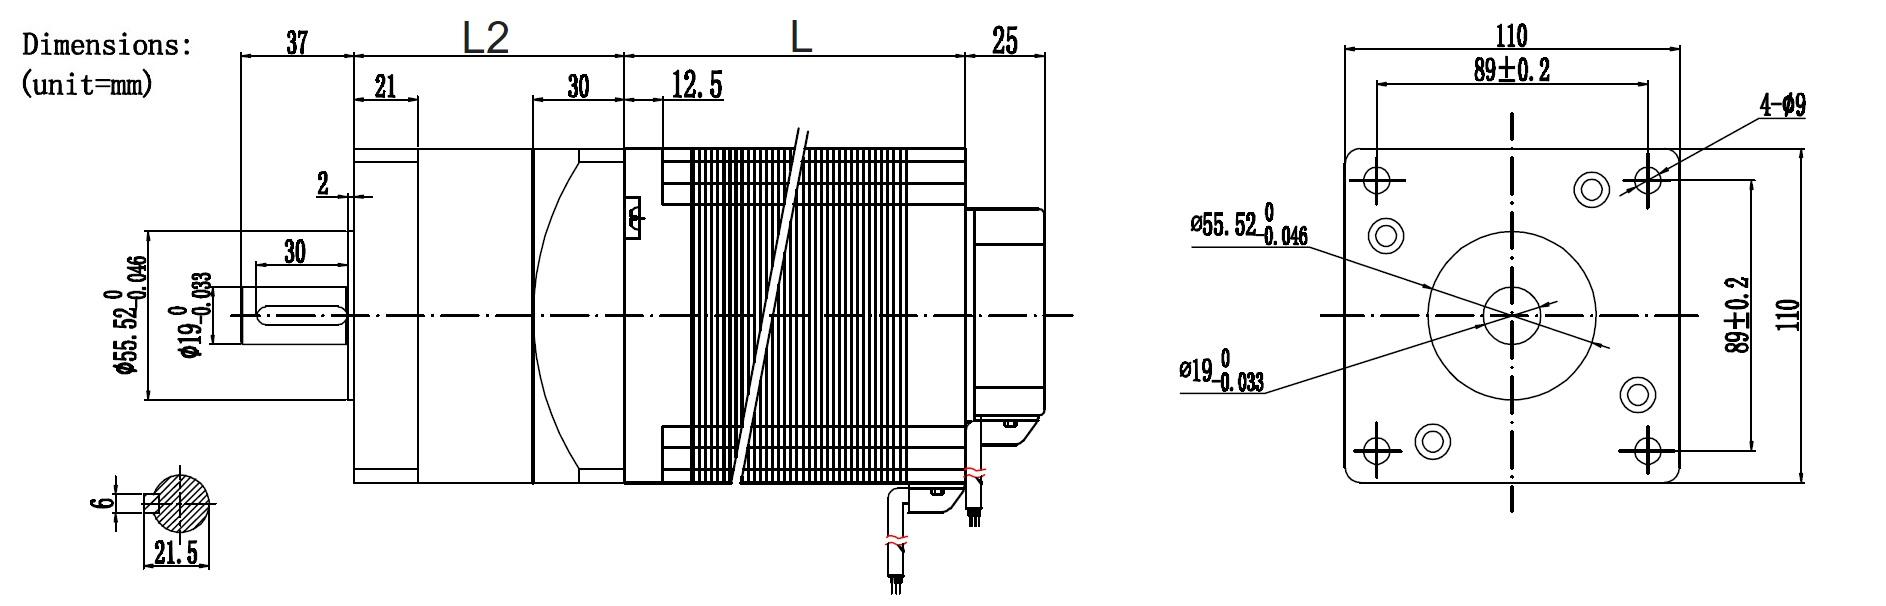 NEMA42 BLDC Motor with gearbox